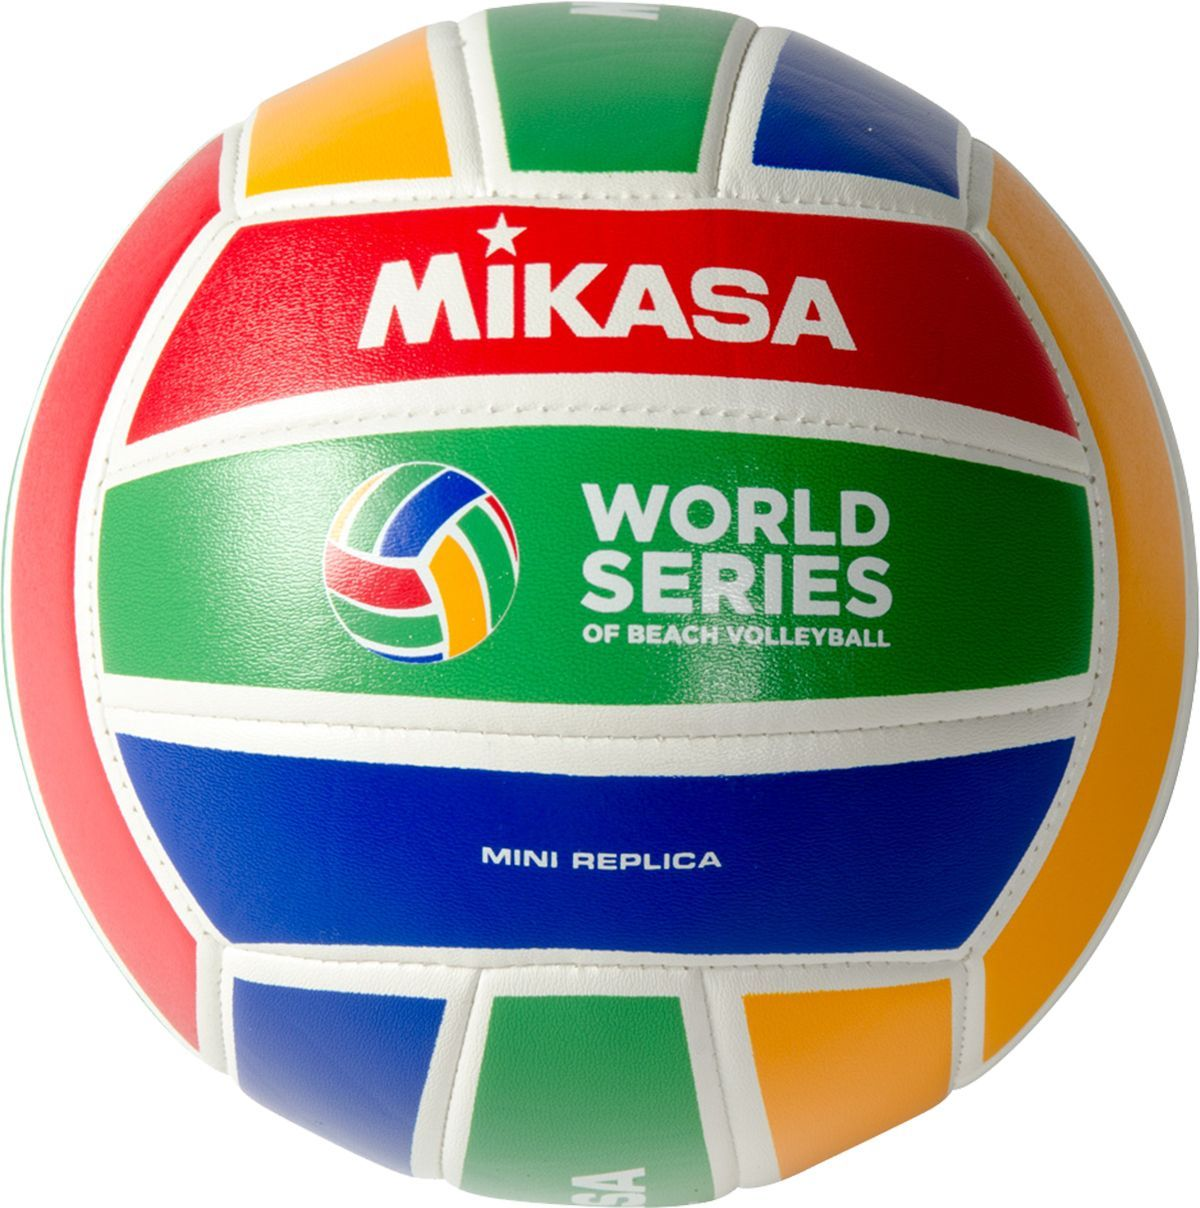 Mikasa World Series Outdoor Mini Volleyball In 2020 Beach Volleyball Volleyballs Volleyball